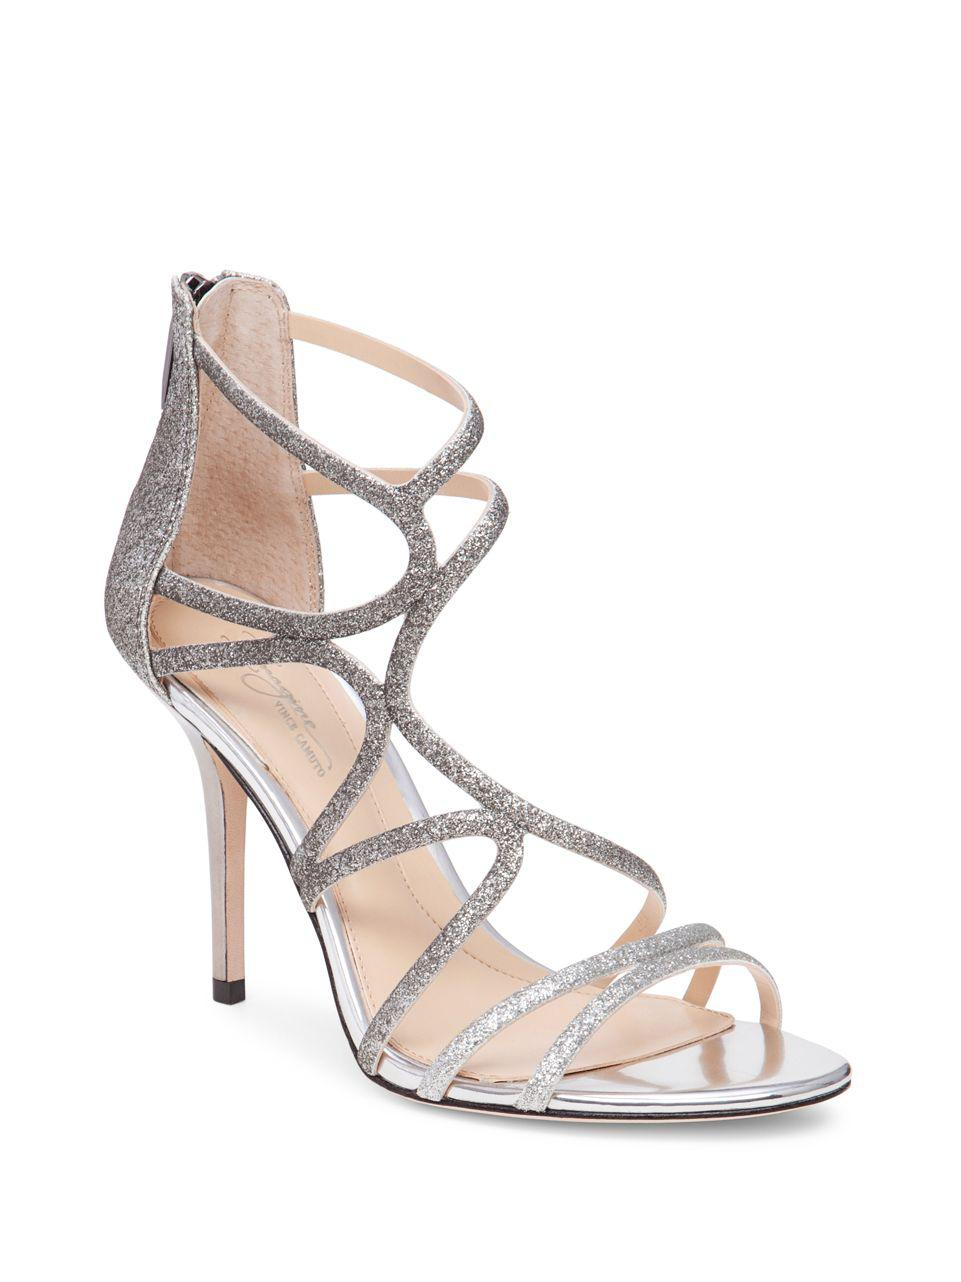 84af67e0619 Imagine Vince Camuto Ranee Glitter Sandals in Metallic - Lyst